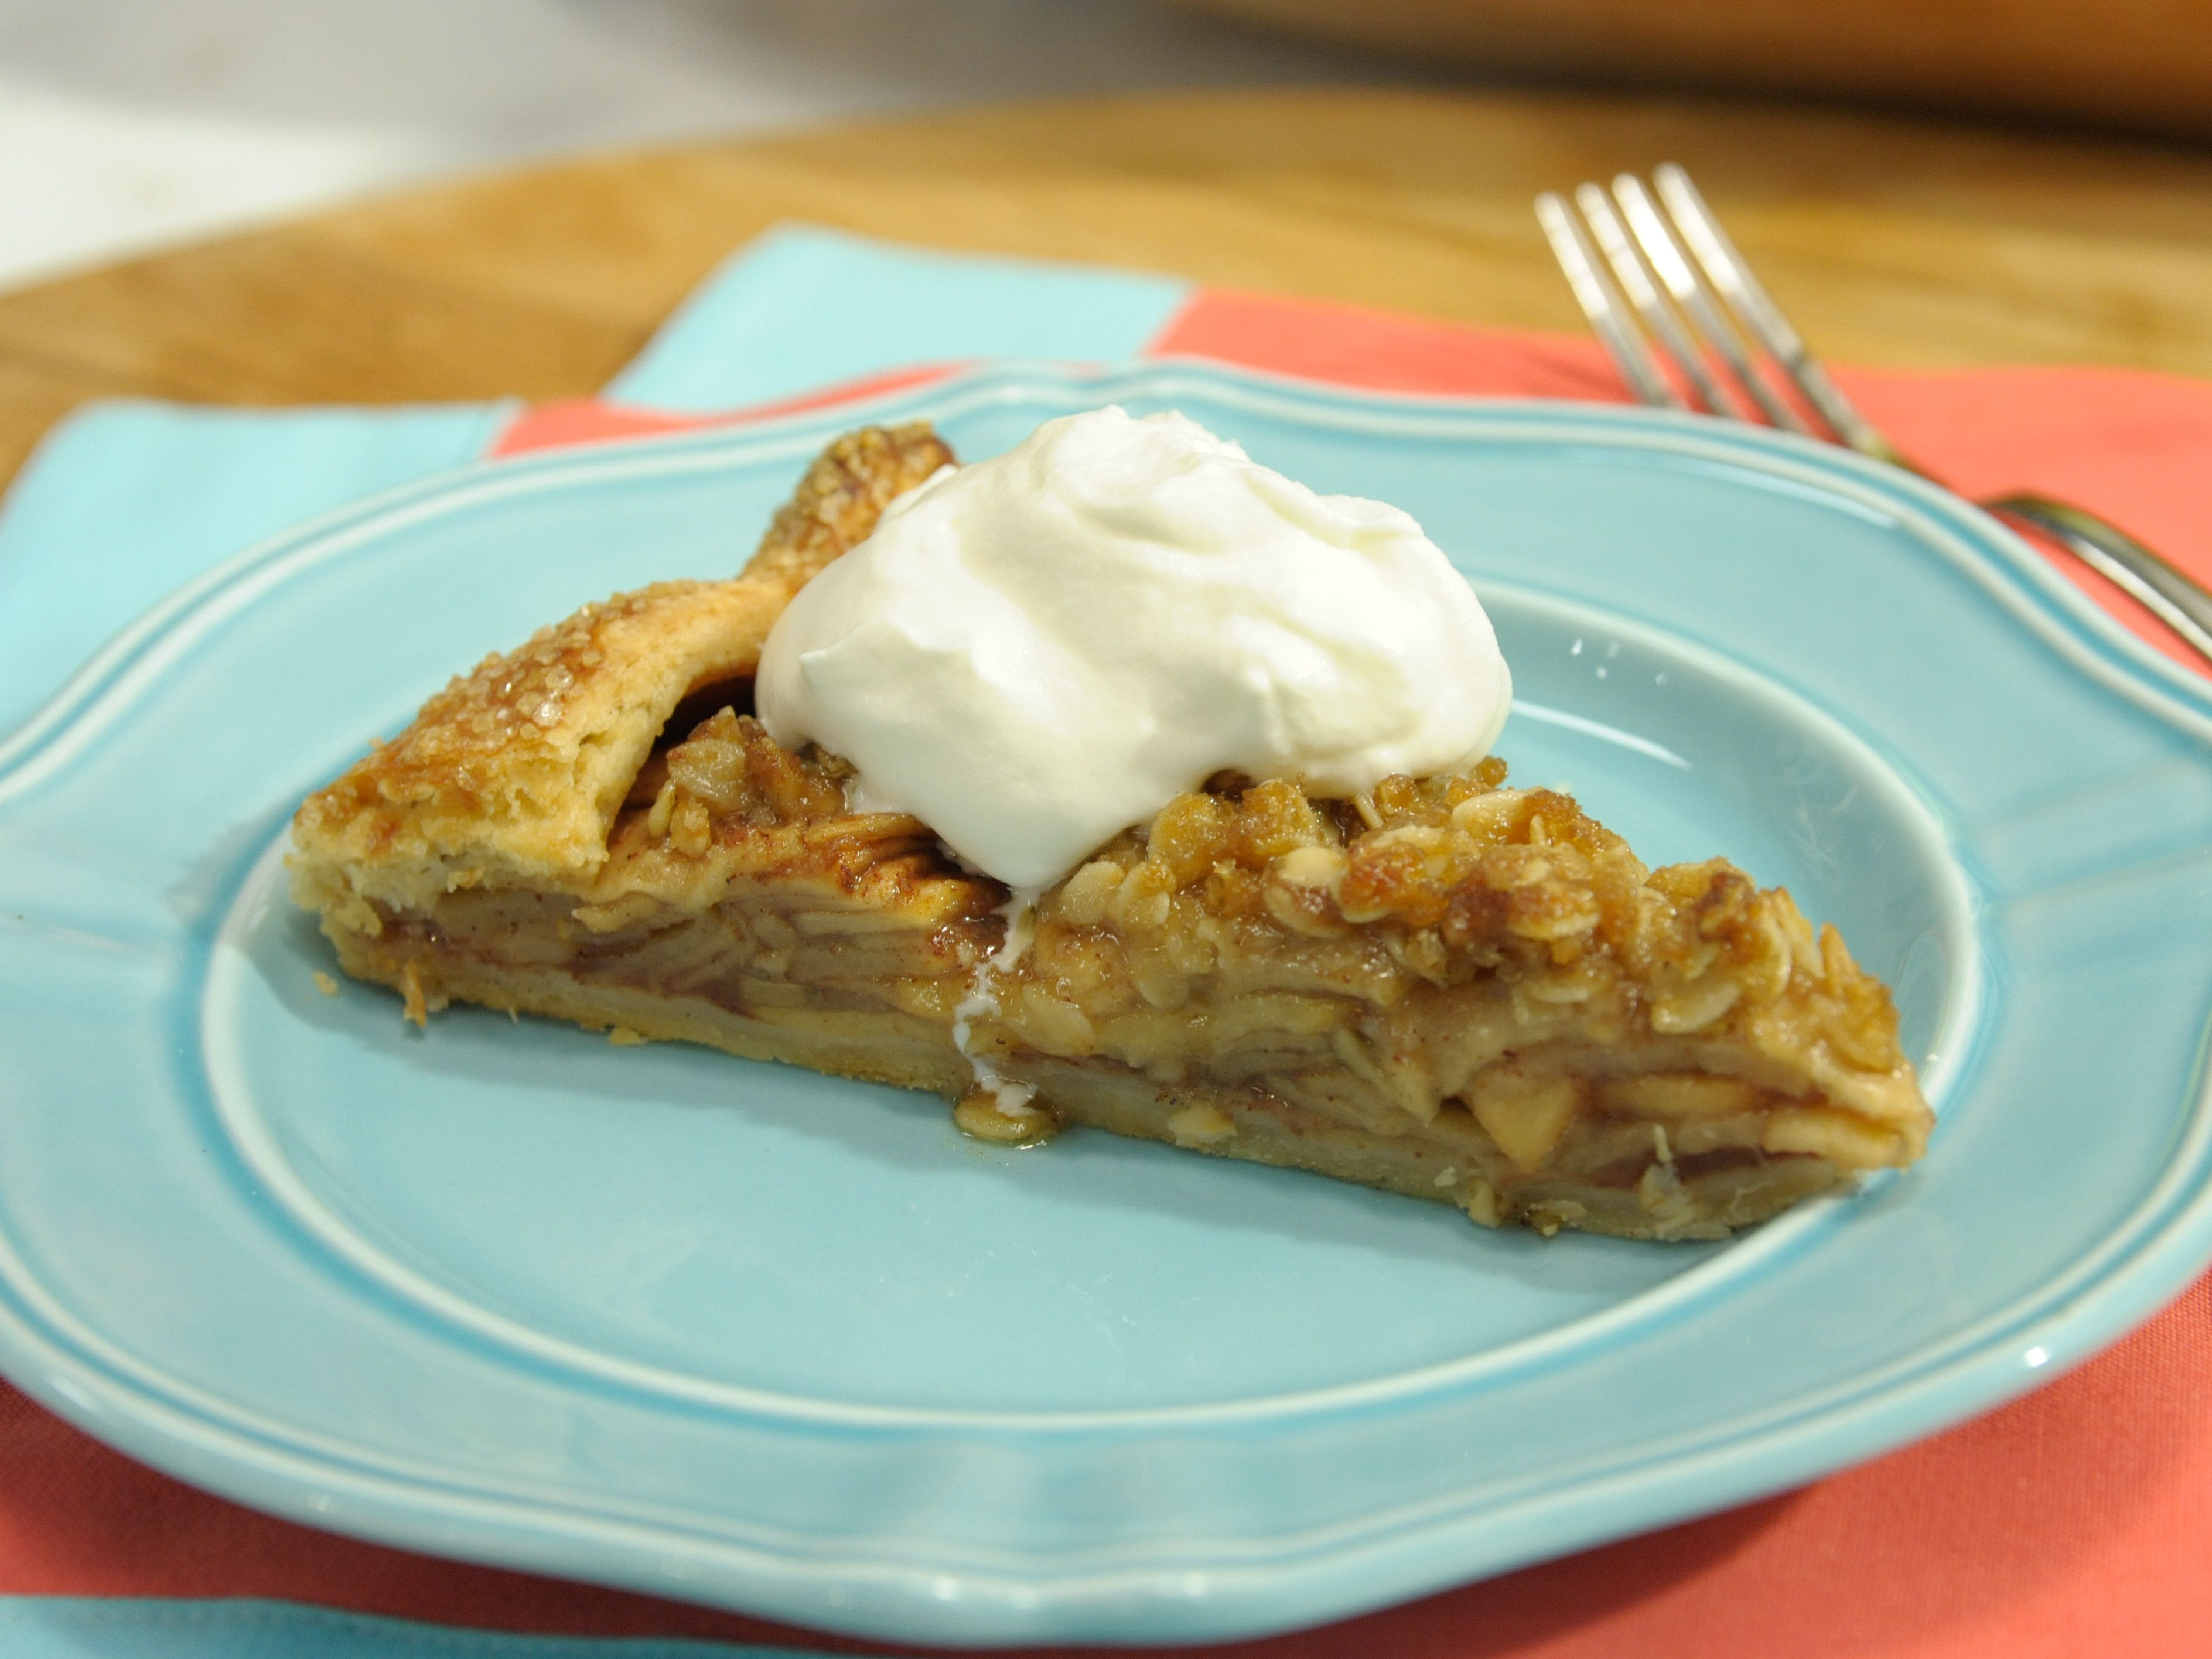 Rustic apple pie crostata recipe crostata recipe katie lee and rustic apple pie crostata recipe crostata recipe katie lee and apple pie forumfinder Choice Image